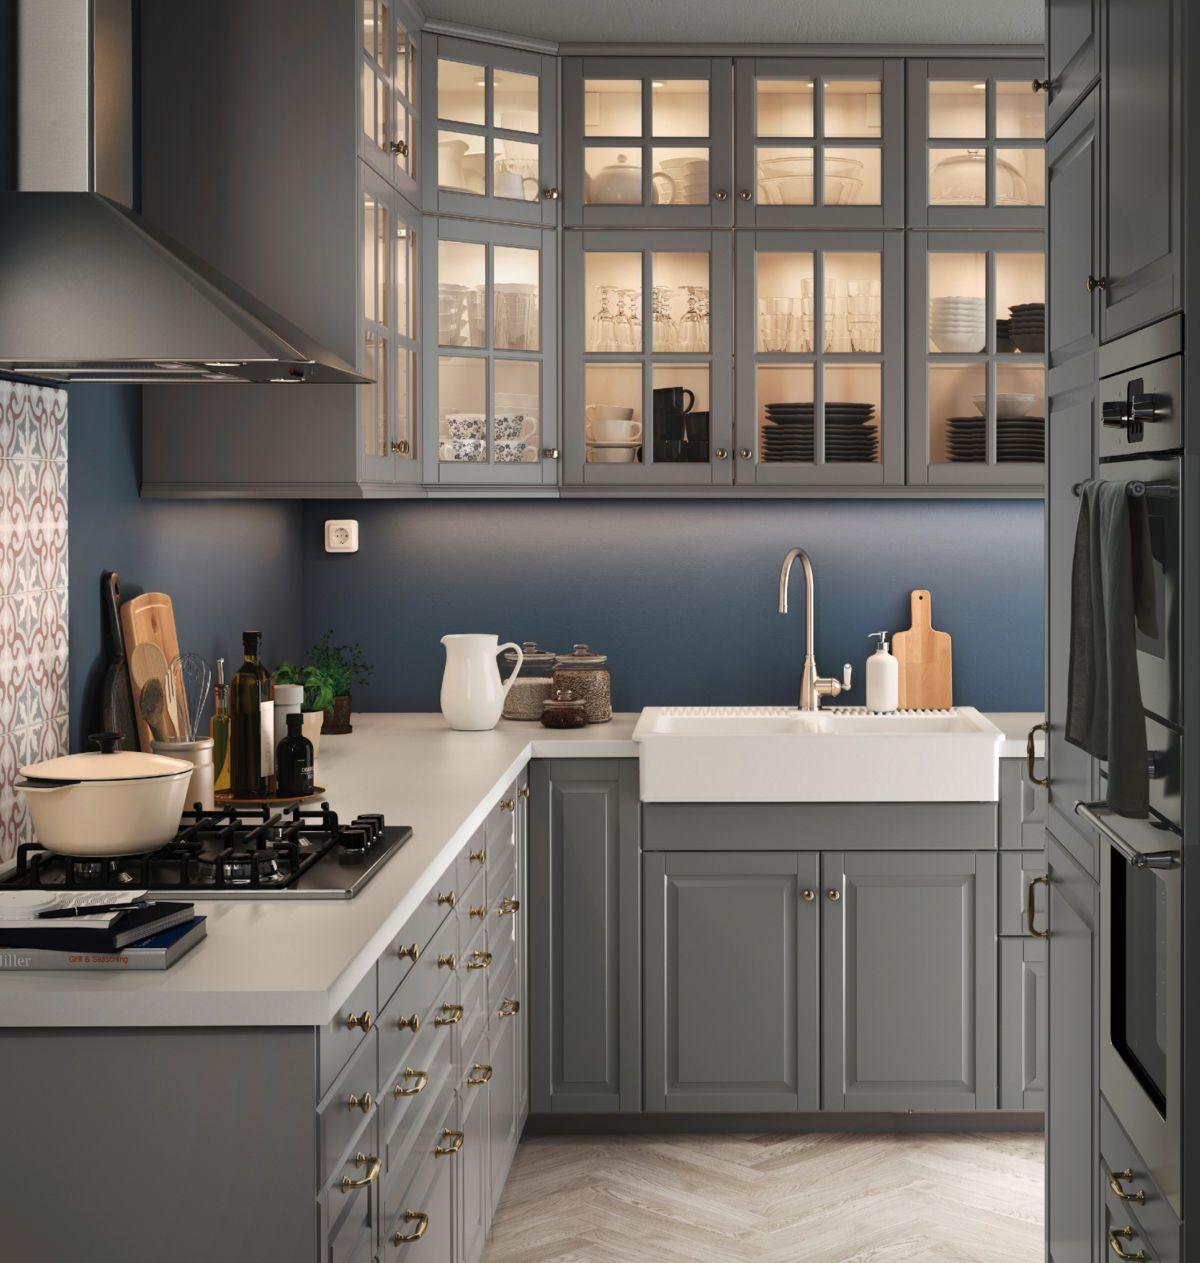 Ikea Kuche Metod Grau   Best Home Ideas 2020   howtohomeinteriors